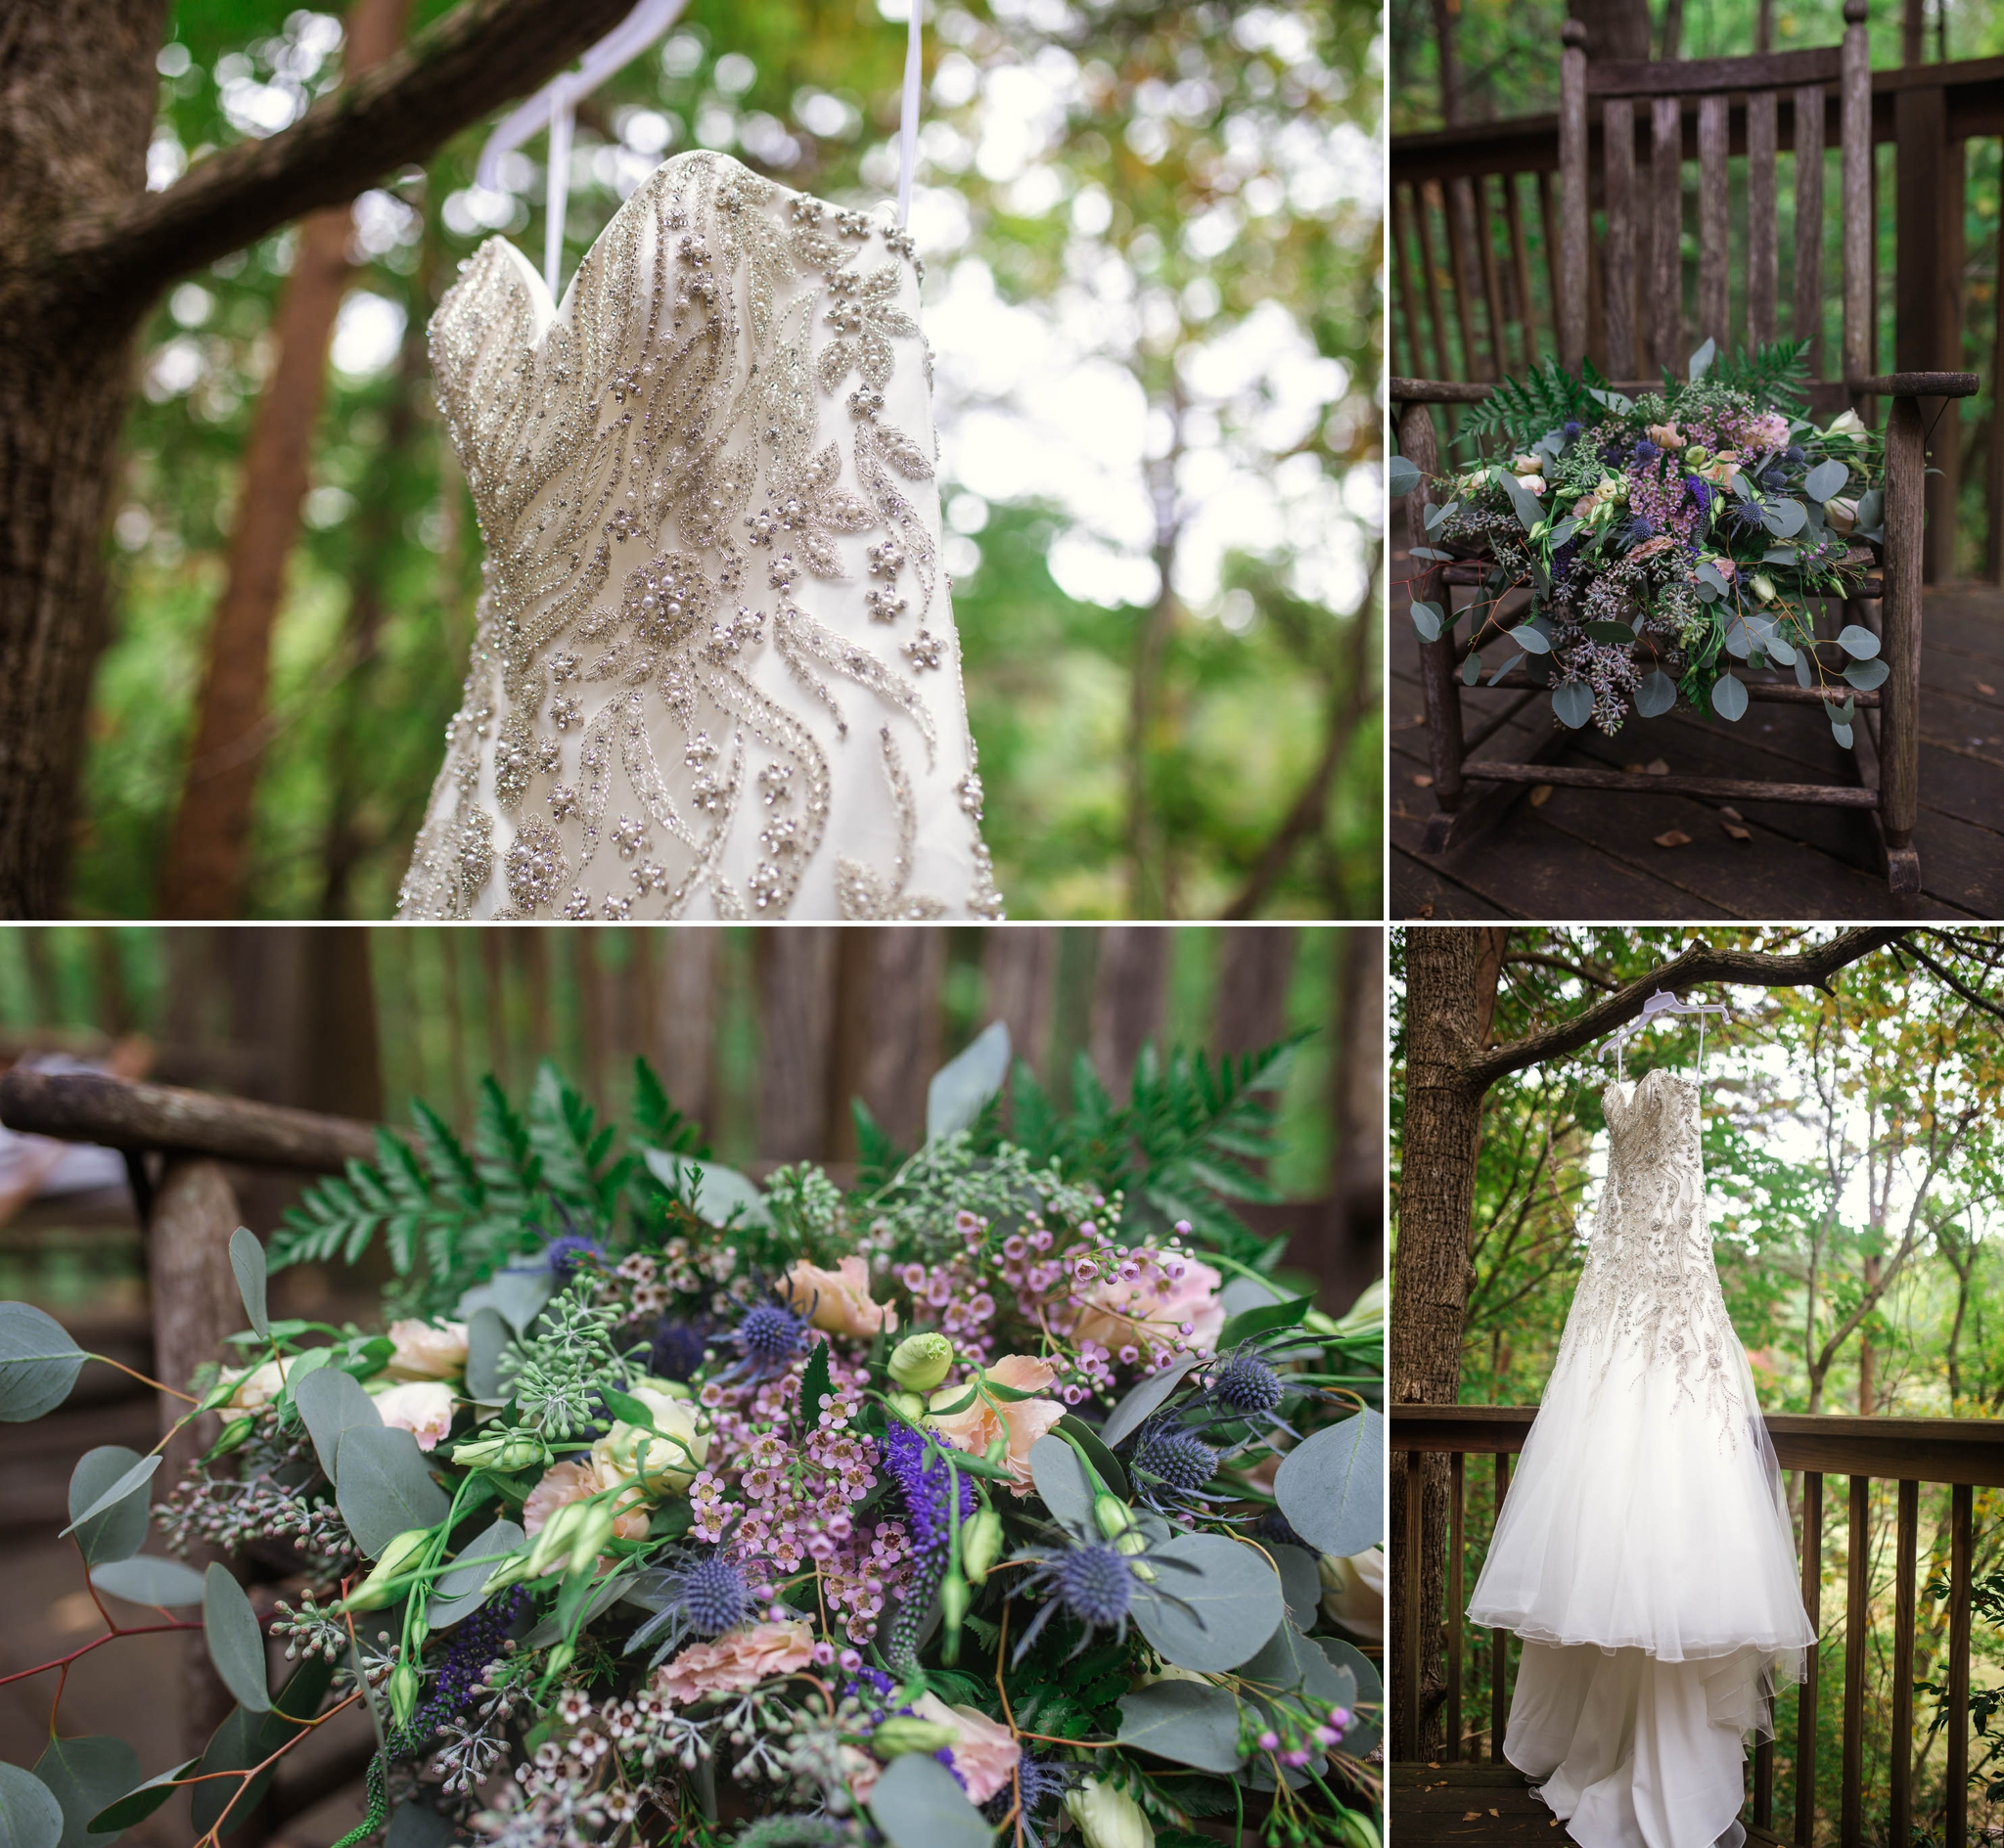 Wedding Photography at the Timberlake Earth Sanctuary in Whitsett, NC - Raleigh North Carolina Wedding Photographer 8.jpg